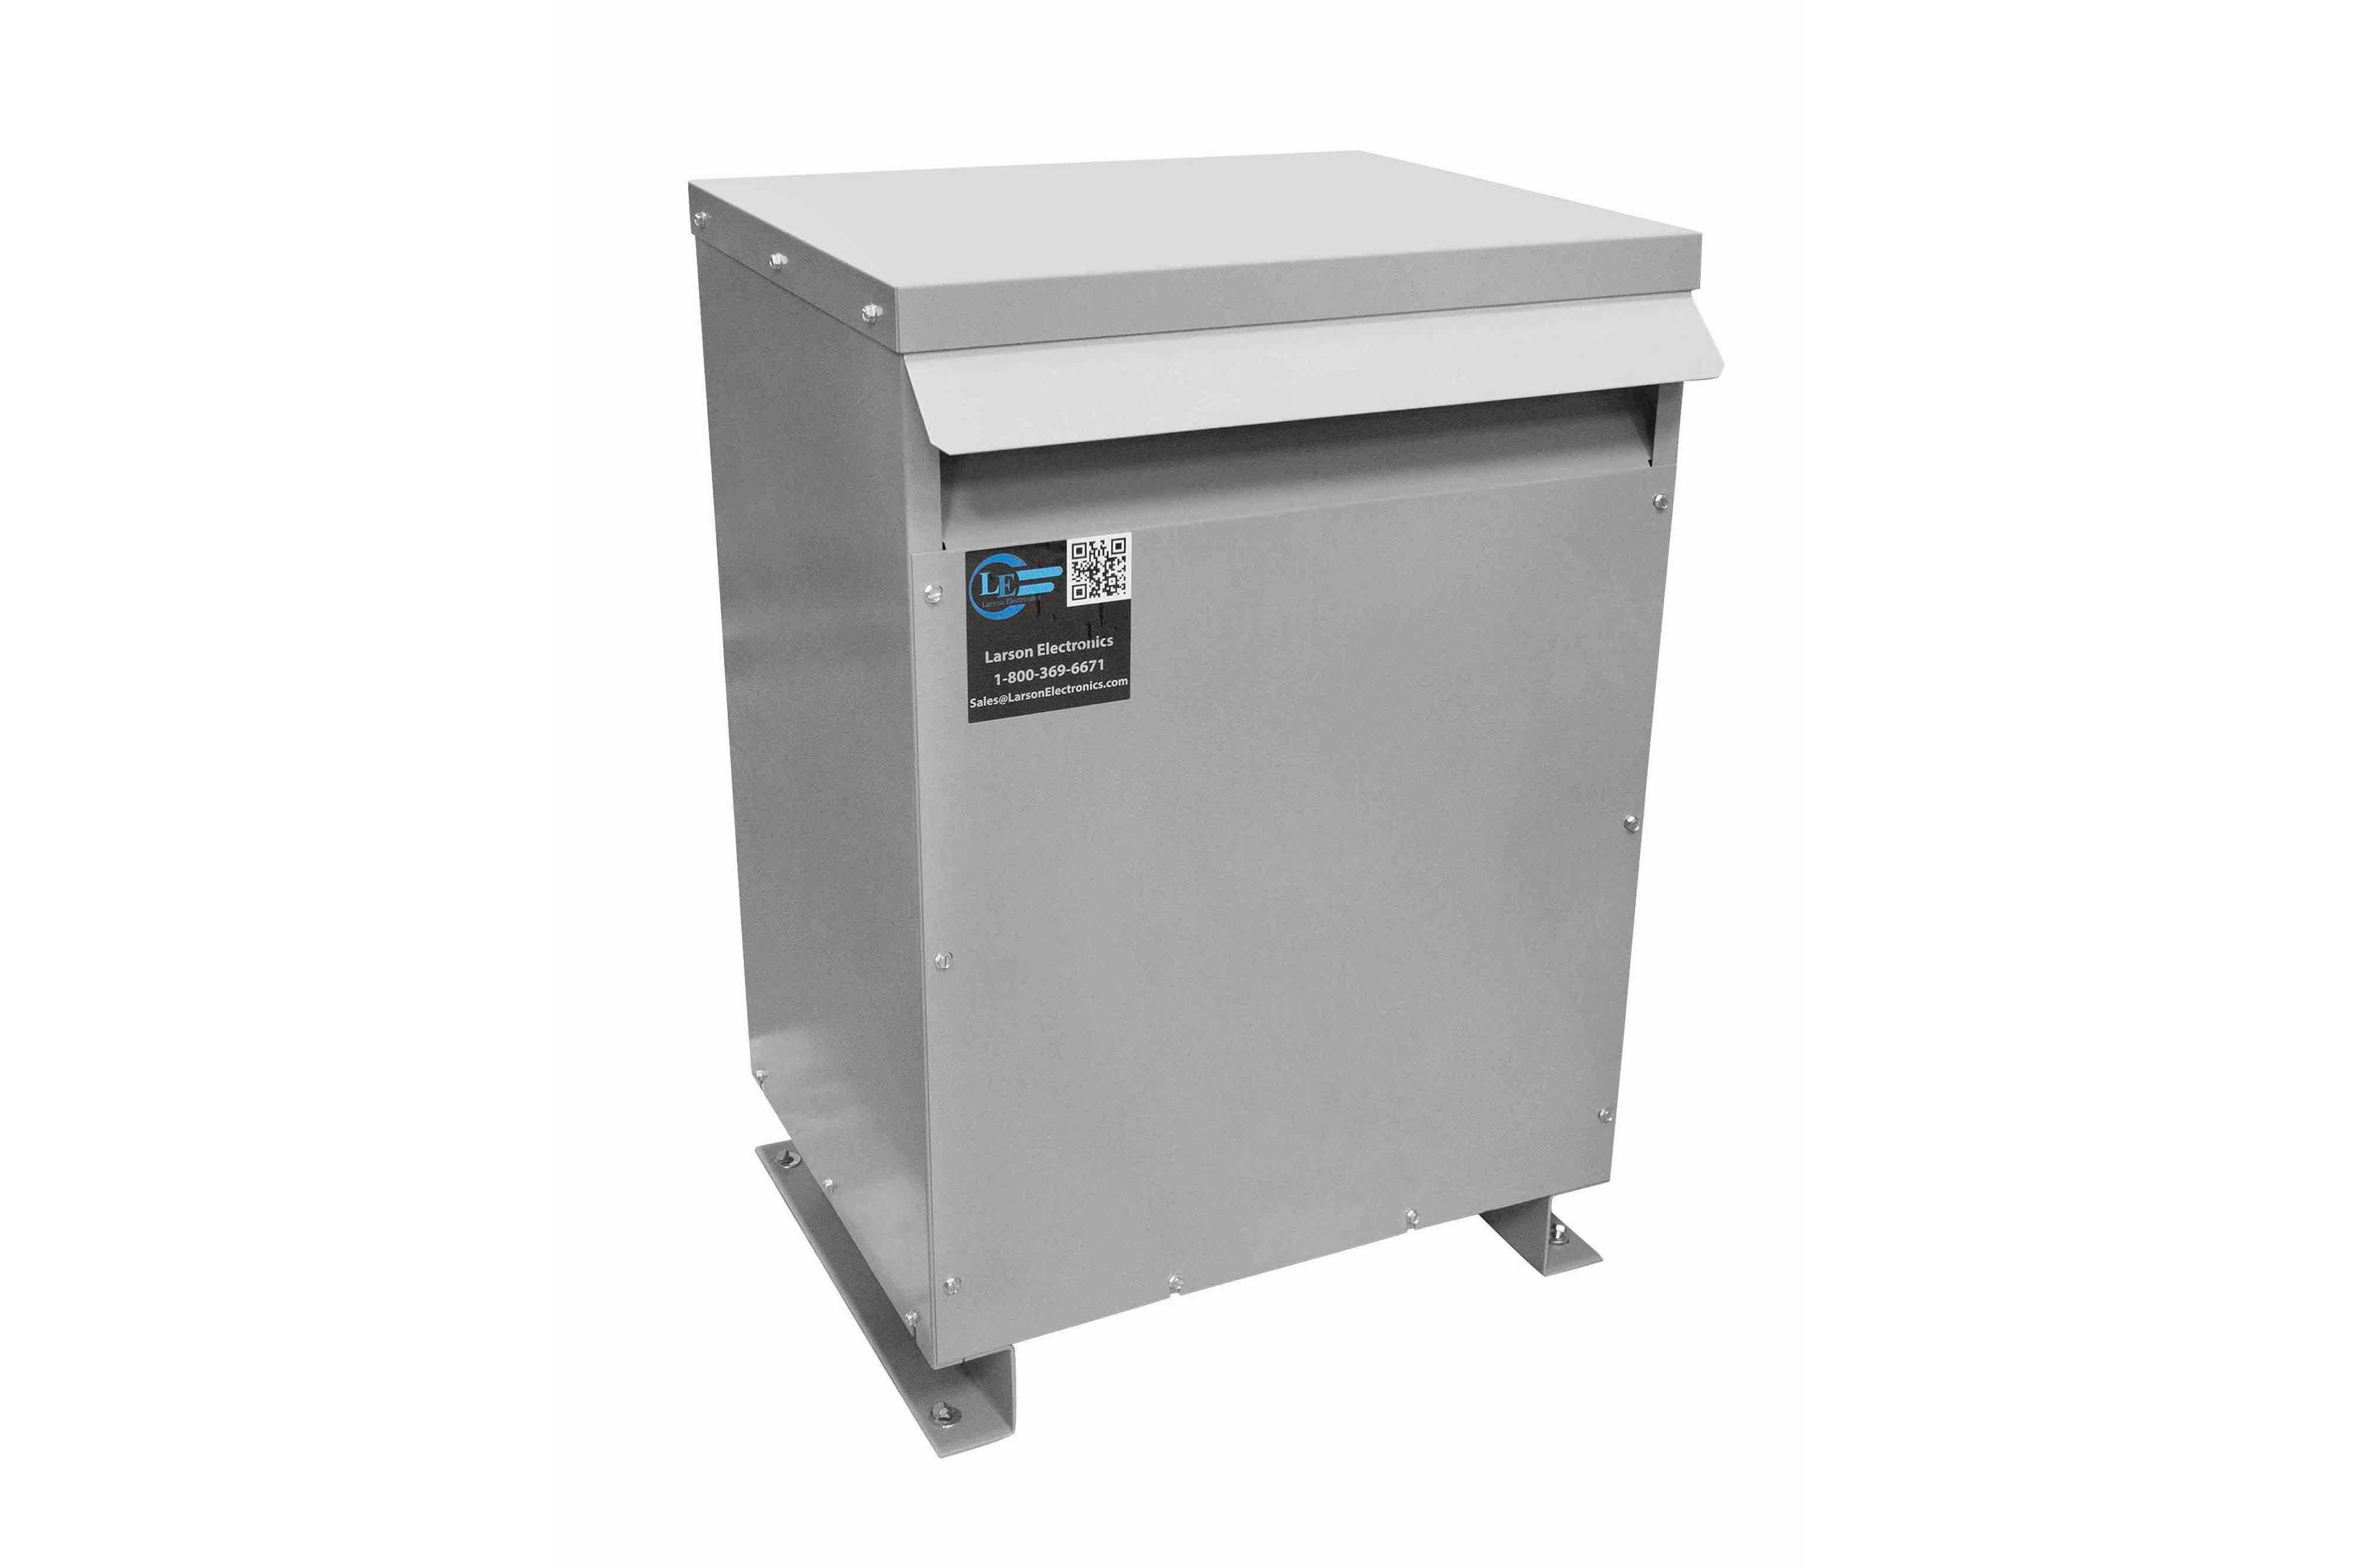 32.5 kVA 3PH Isolation Transformer, 240V Wye Primary, 380V Delta Secondary, N3R, Ventilated, 60 Hz